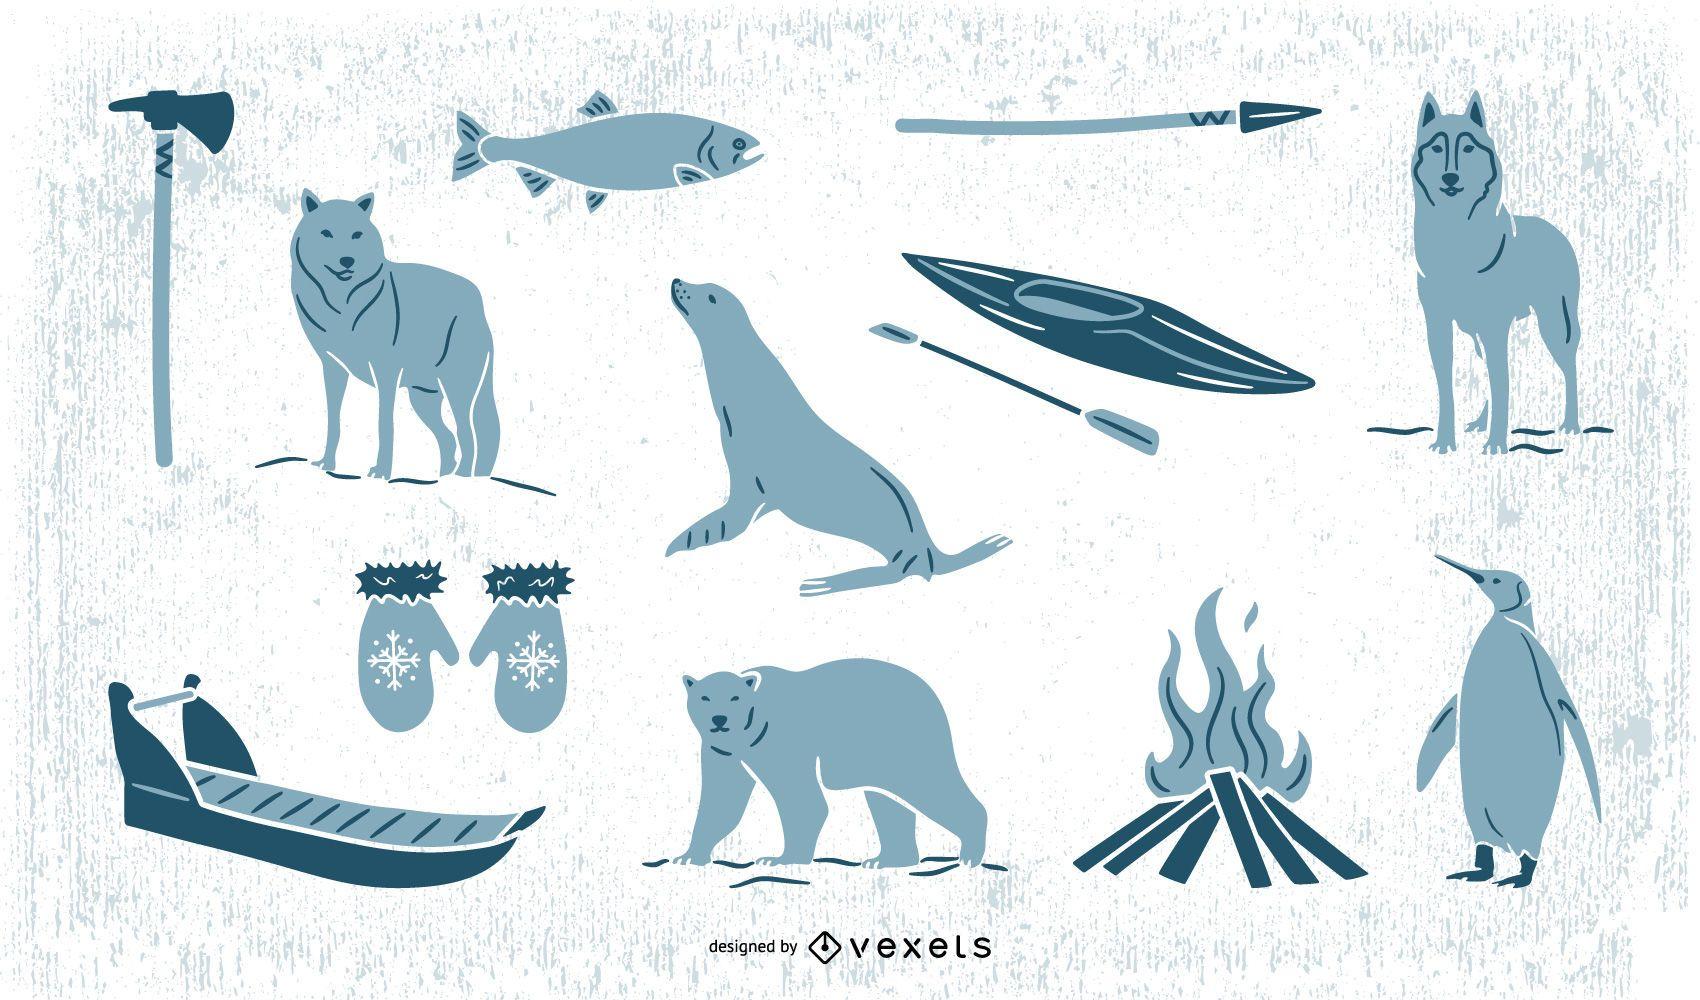 Paquete de elementos esquimales Doodle Monocolor